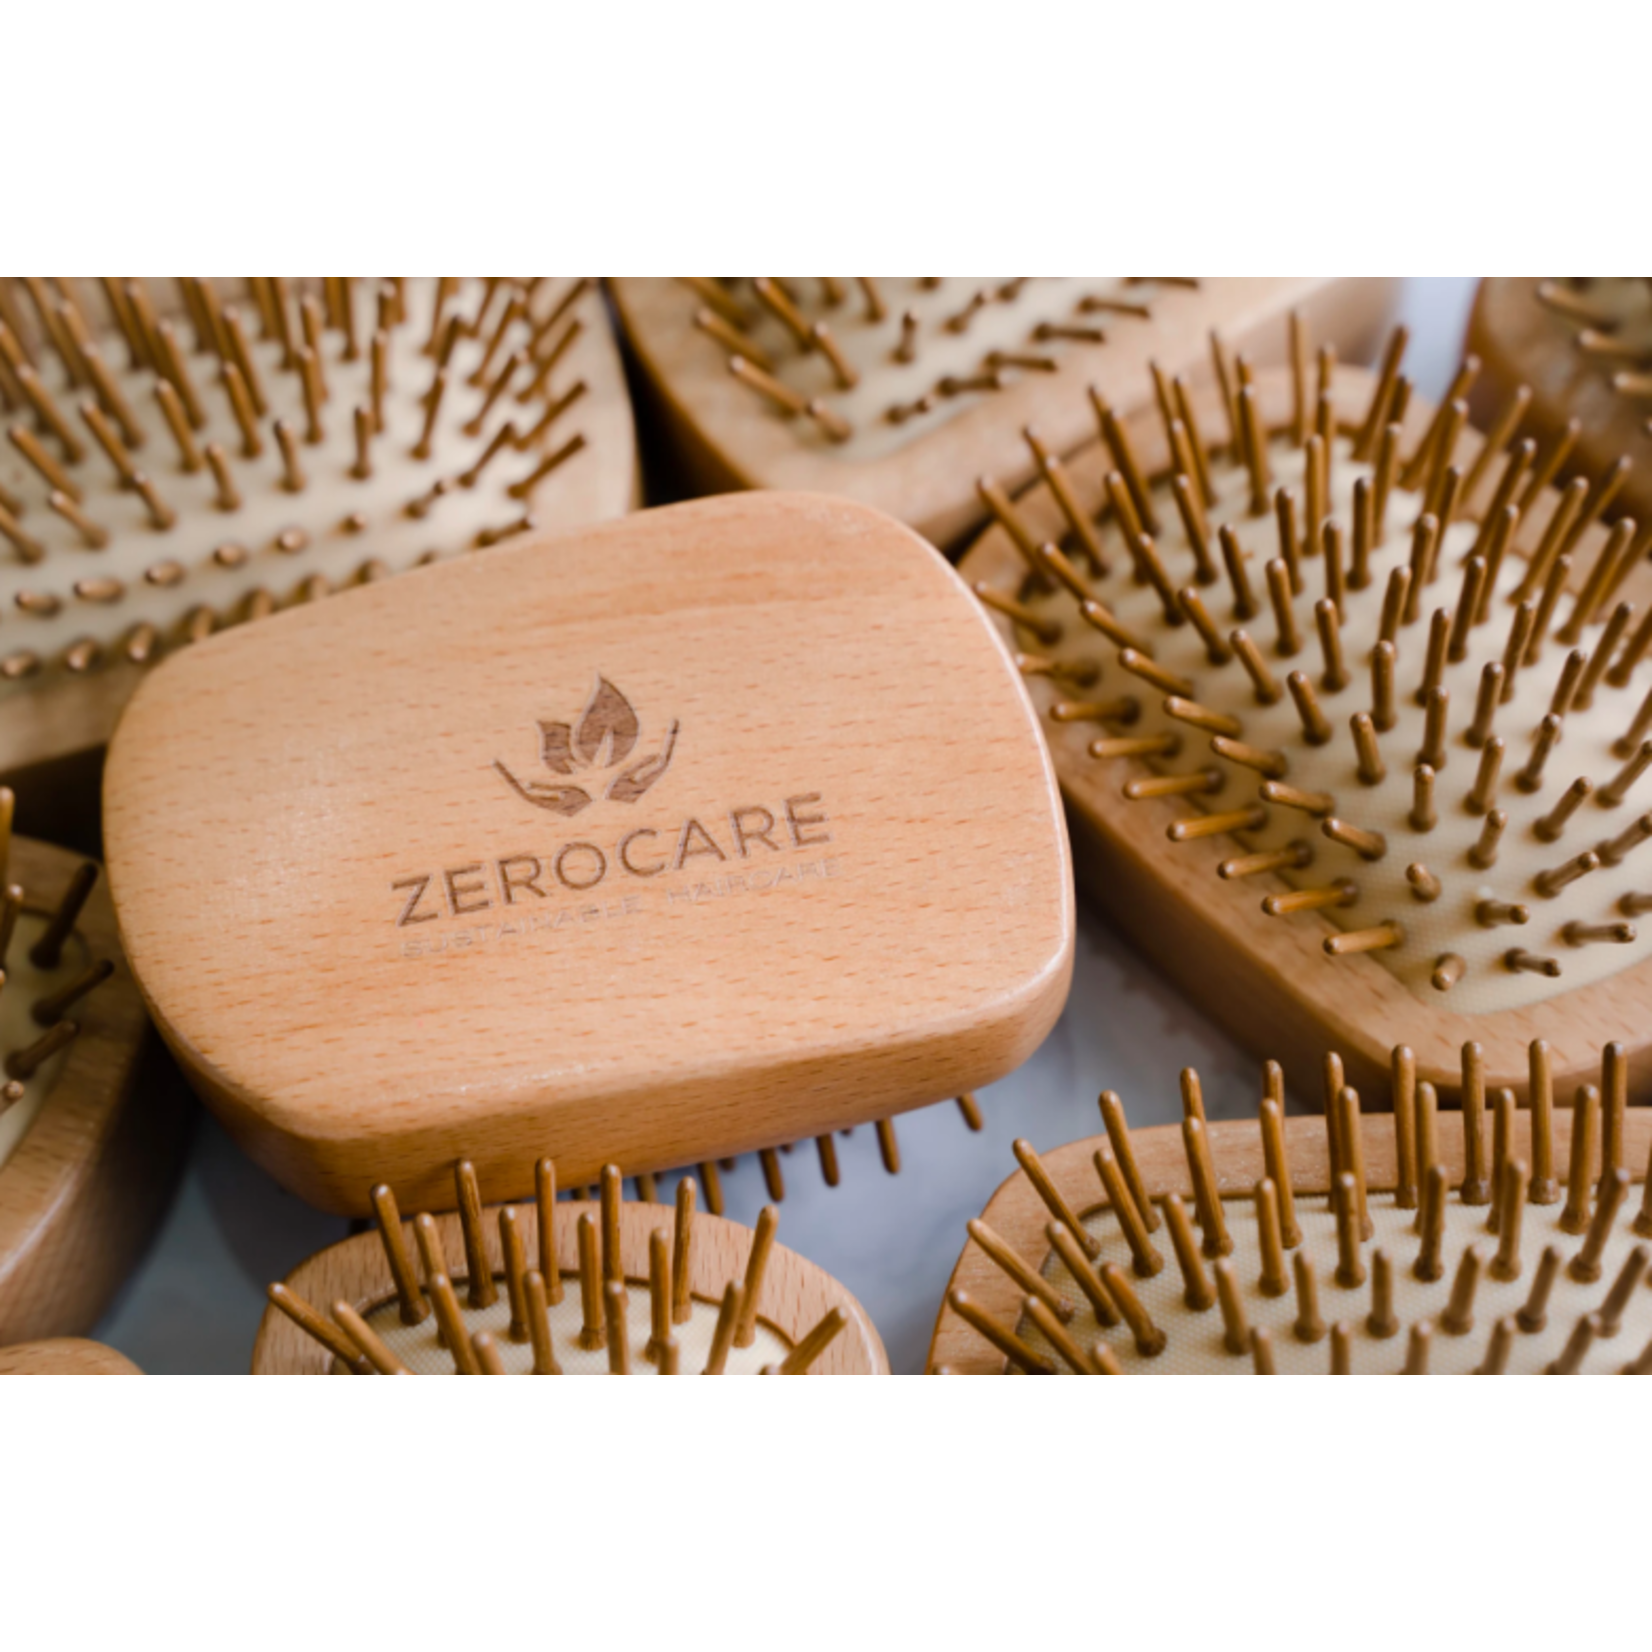 Zerocare Zerocare Bamboo Detangler Brush